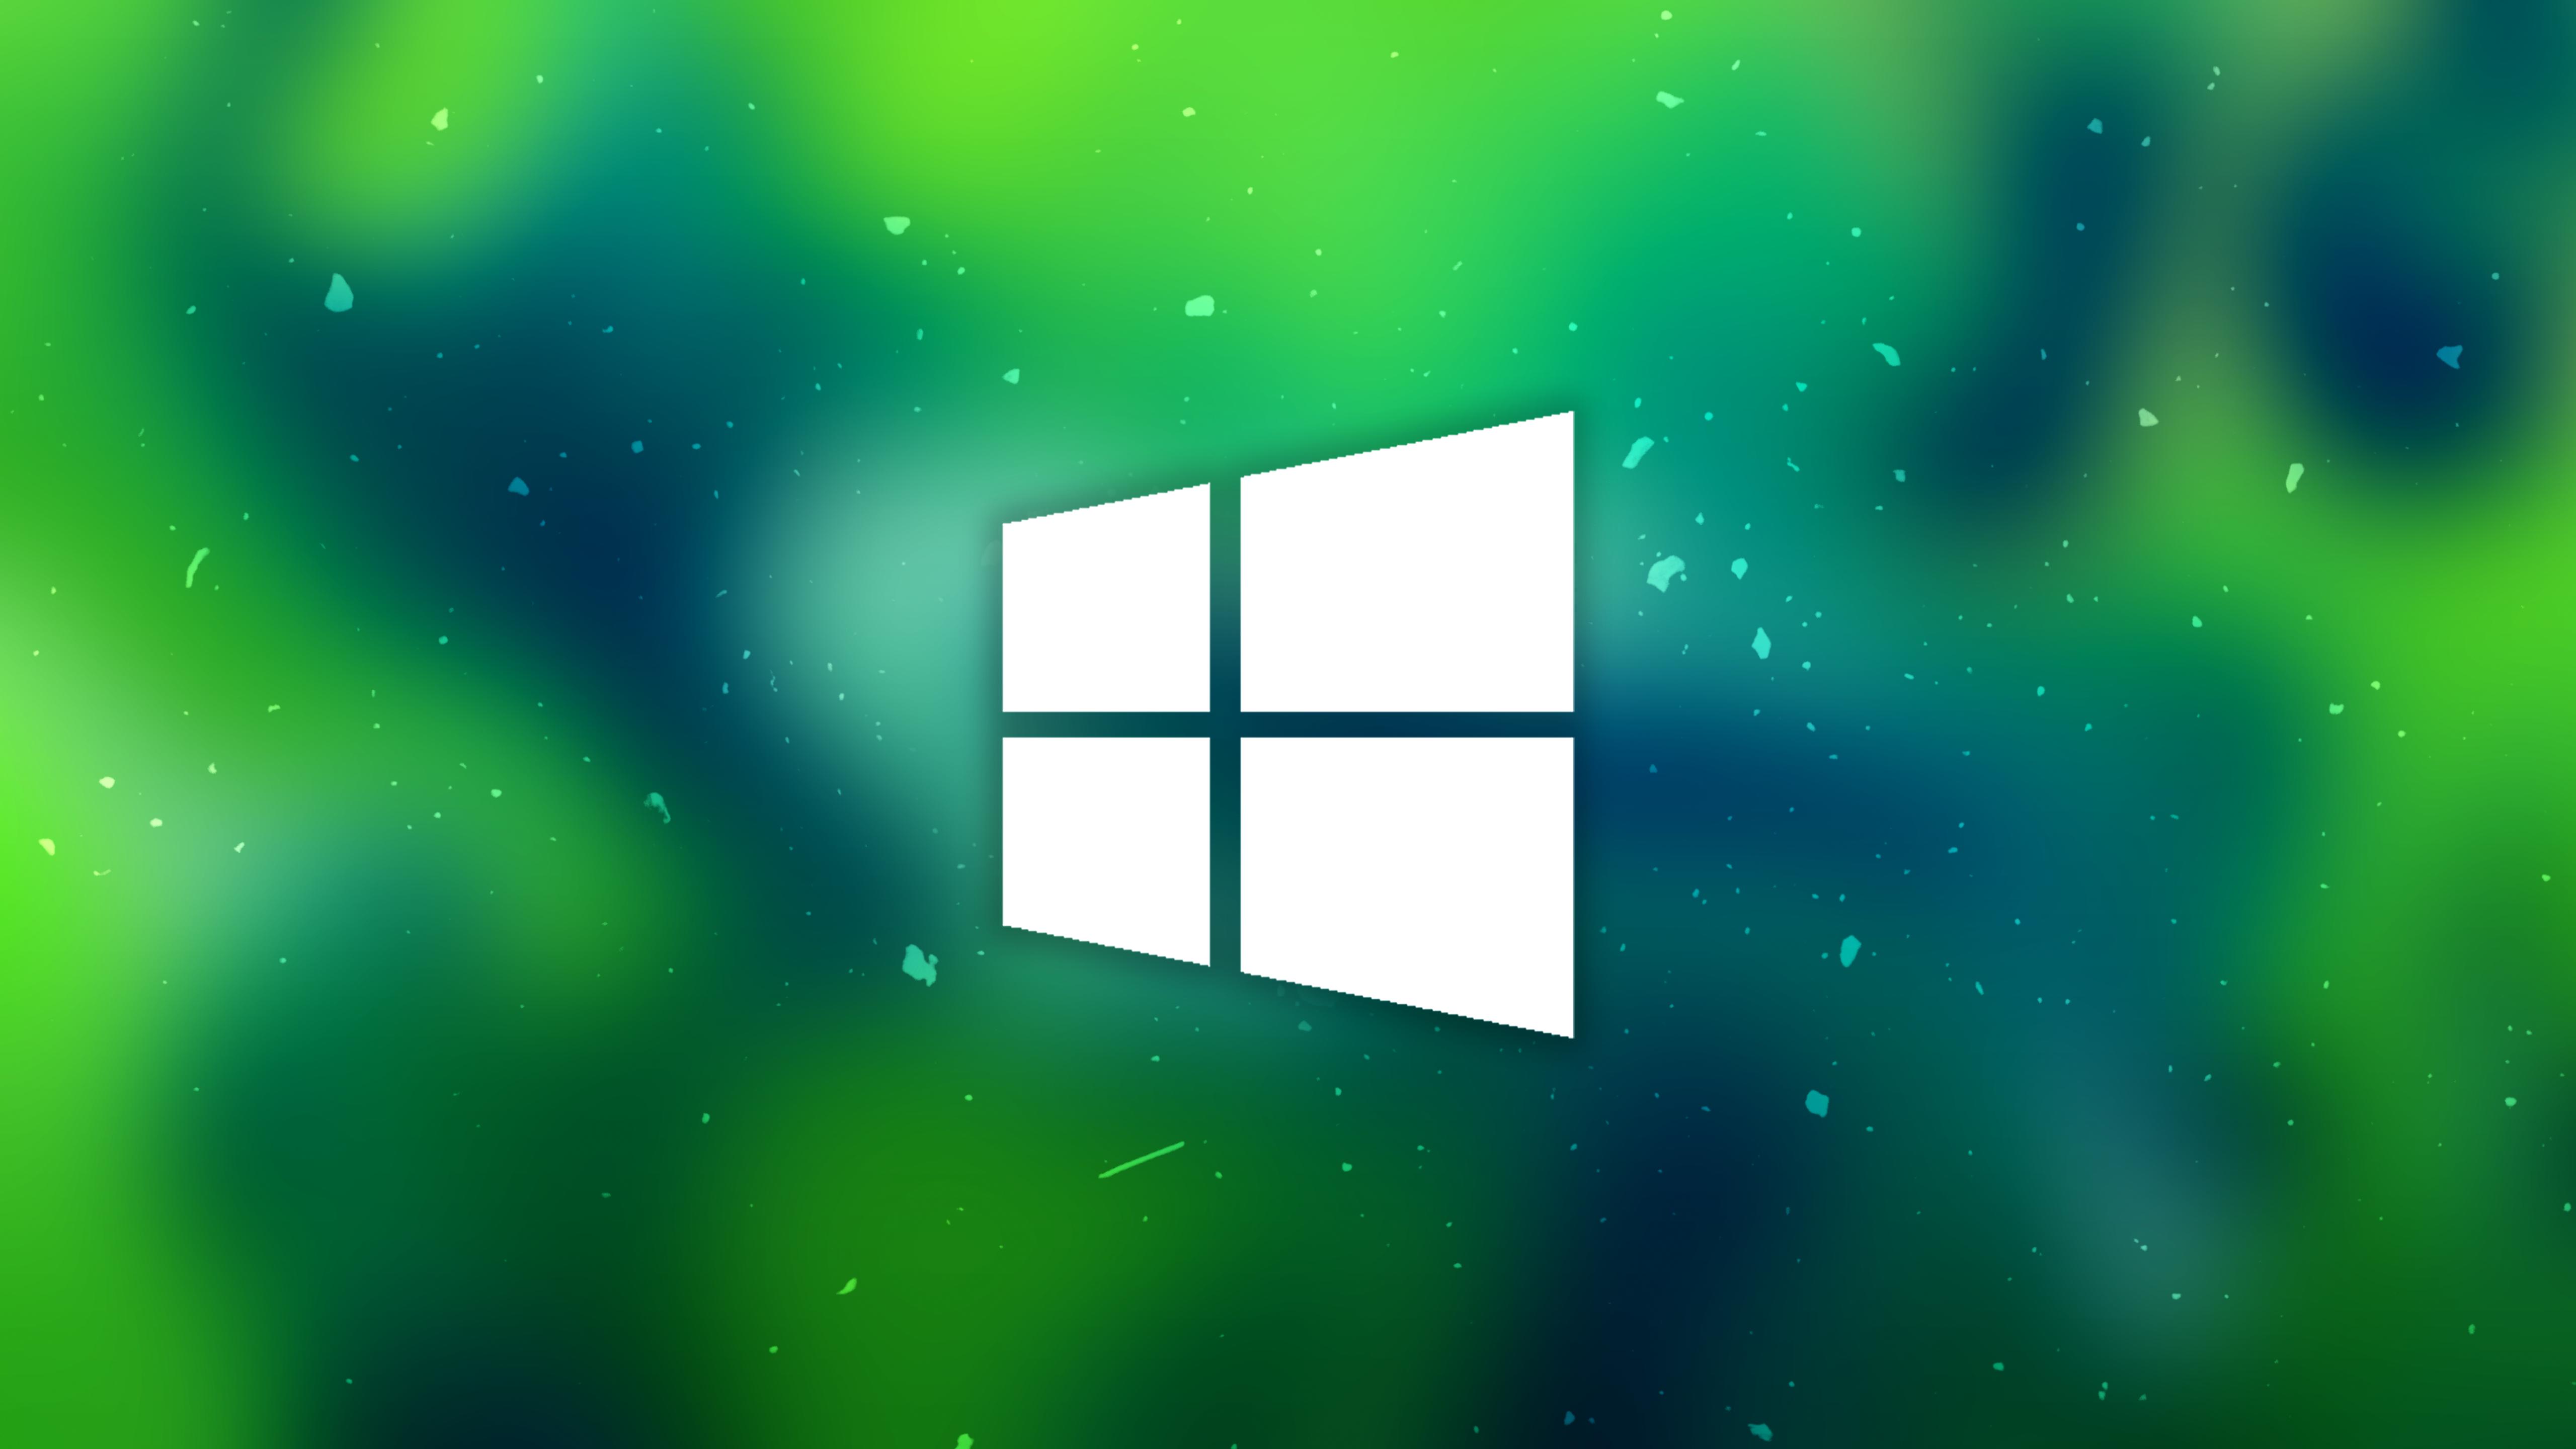 windows 10 green background - hola.klonec.co